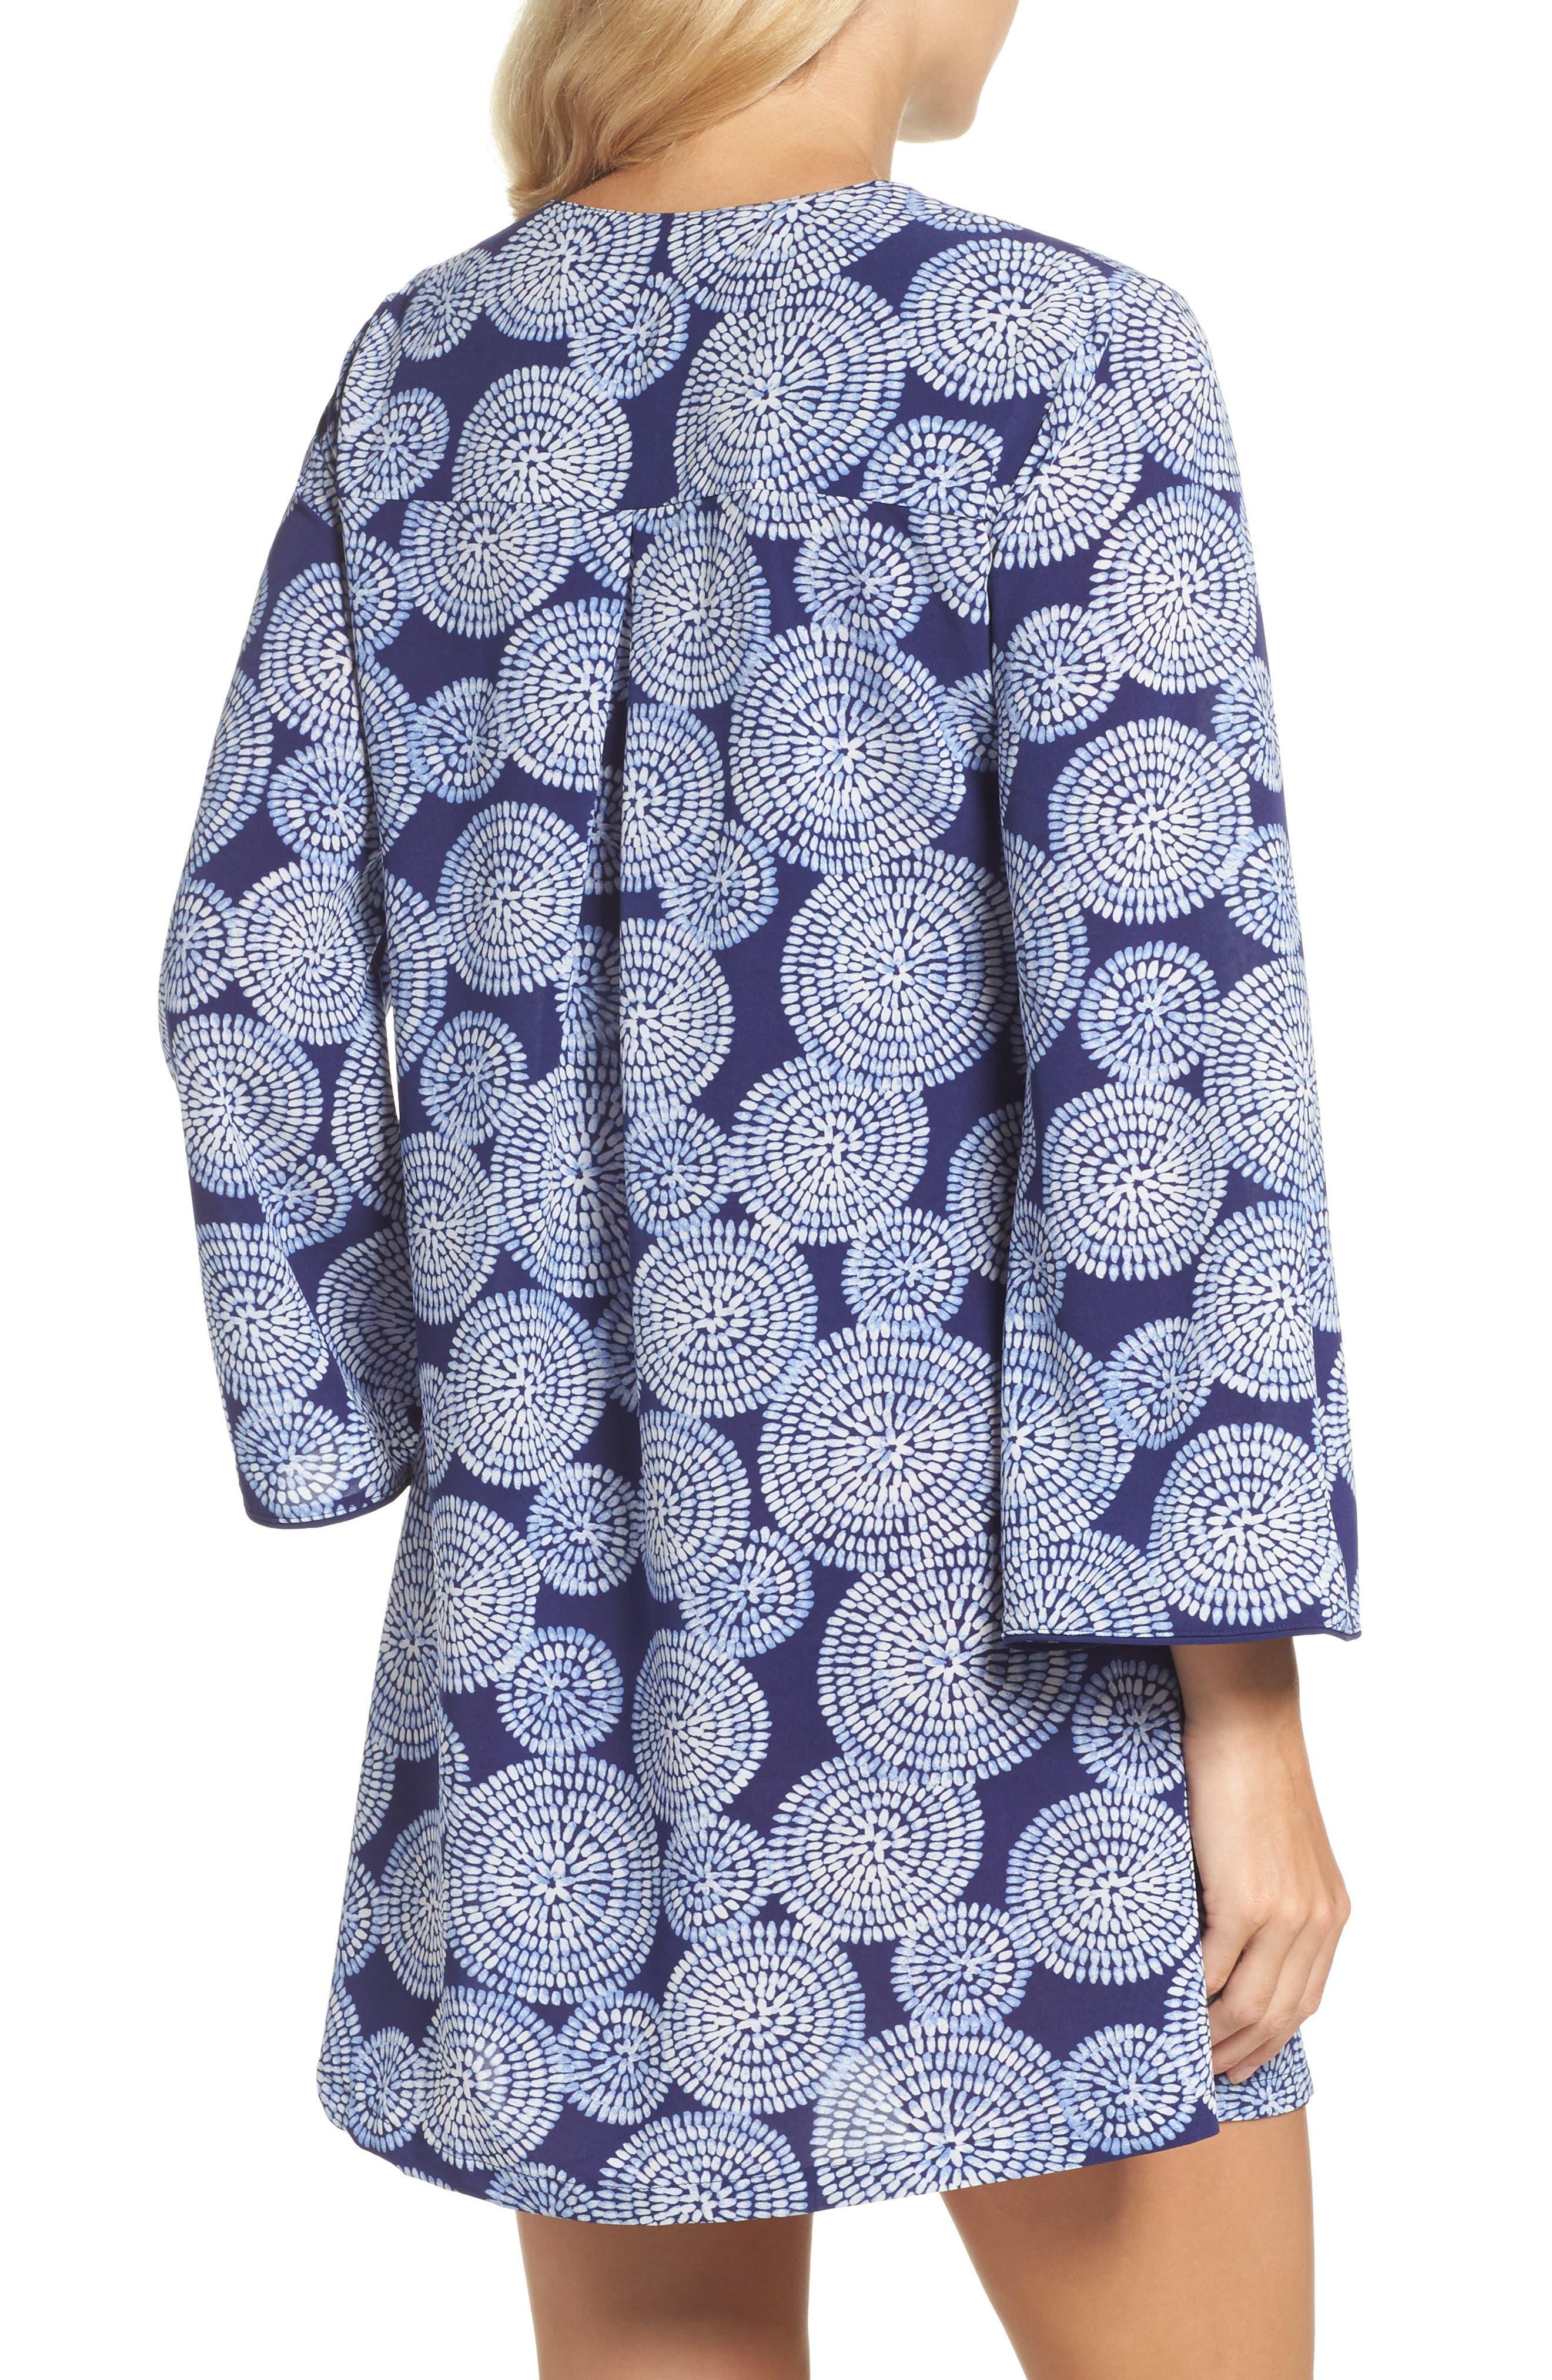 Sleepwear Halftan Short Nightgown,                             Alternate thumbnail 2, color,                             498